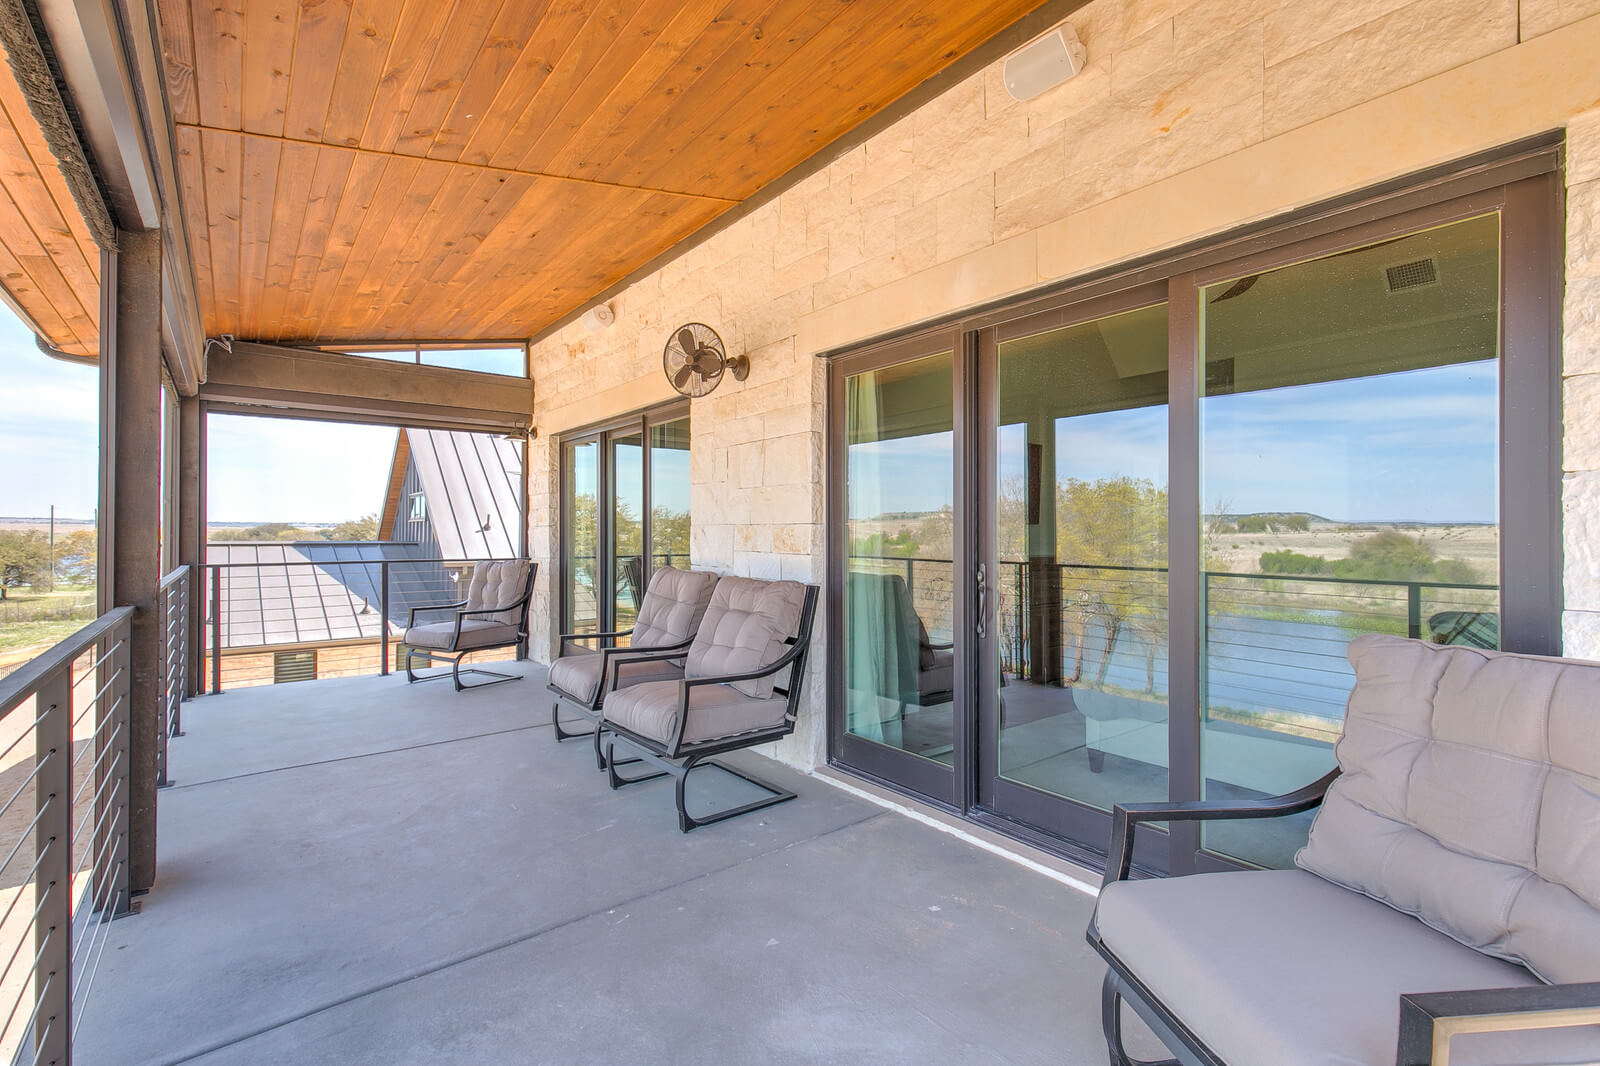 Steve-Bumpas-Custom-Homes-The-Residences-at-Rough-Creek-Lodge-Beck-94.jpg